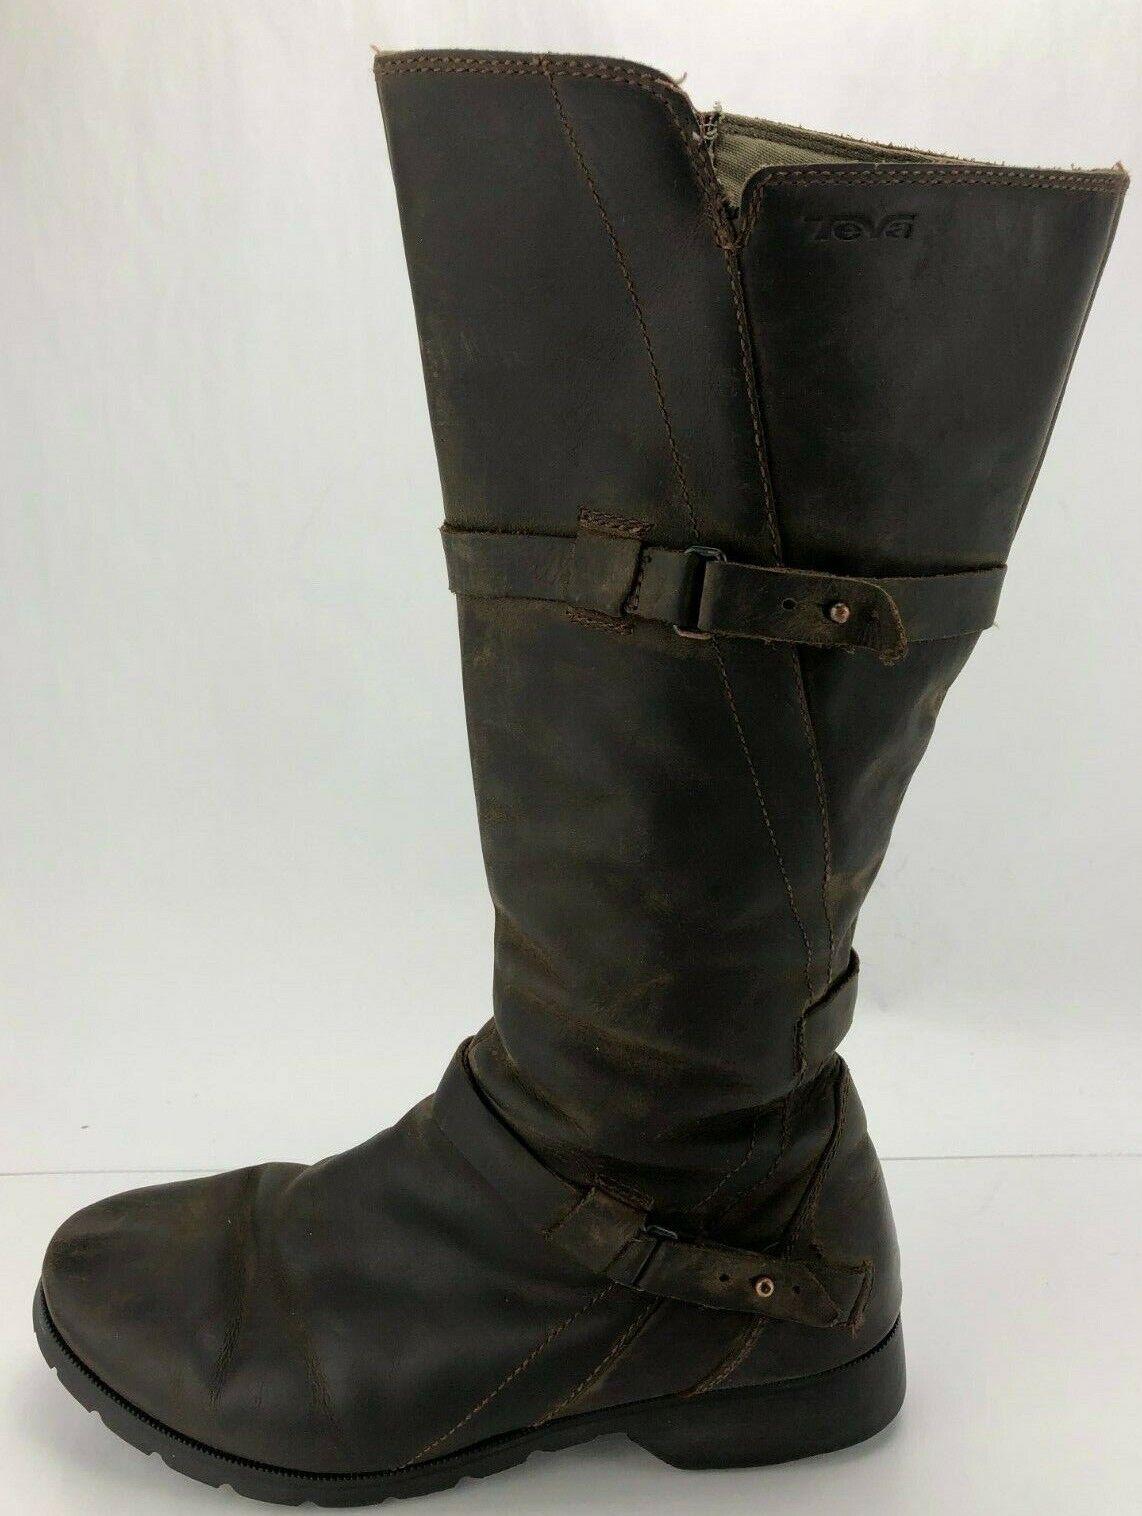 Teva De La Vina Boots  Tall Brown Brown Brown Leather Waterproof Riding Knee High Womens 8 a422bb